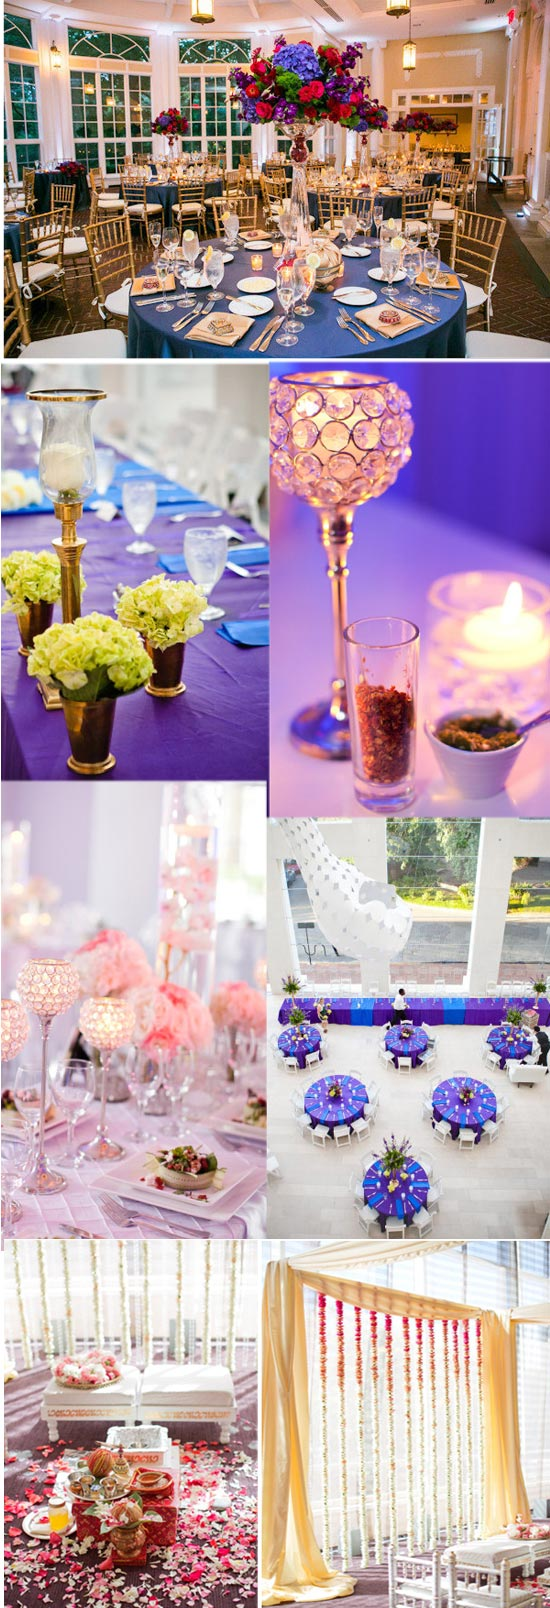 dekor-svadebnogo-zala-v-indiiskom-stile Свадьба в индийском стиле